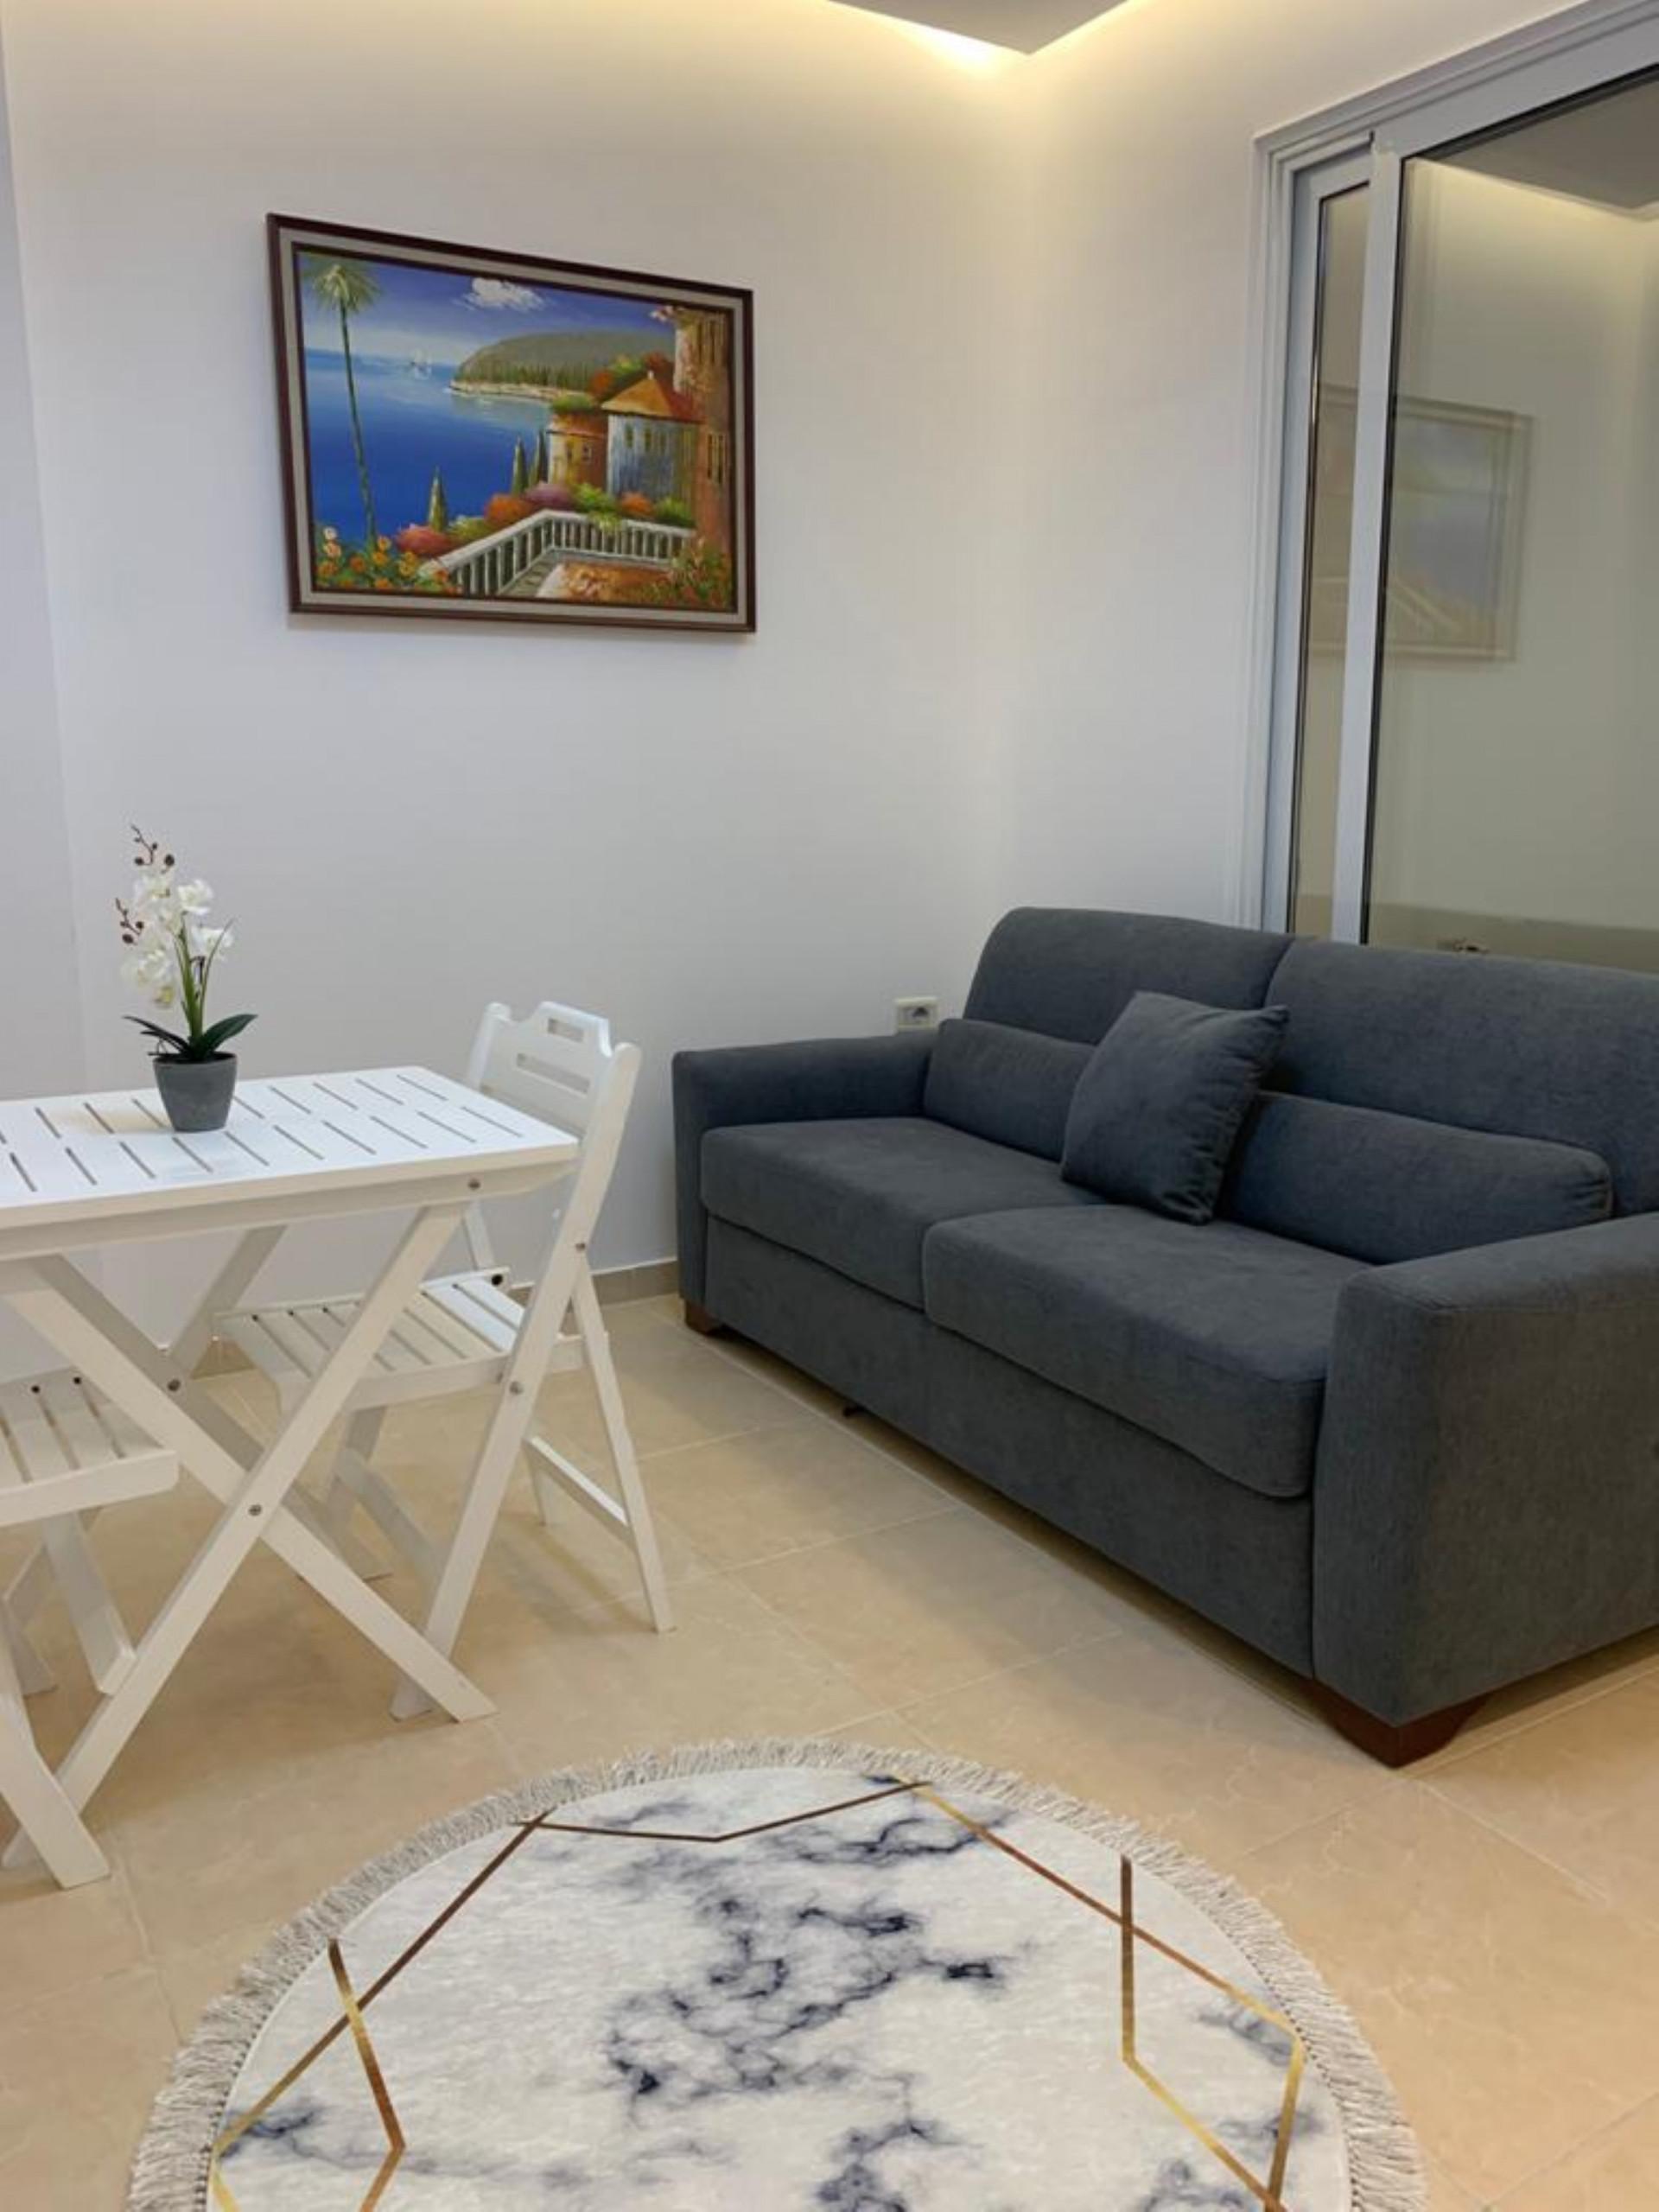 Vlorë - Appartamento